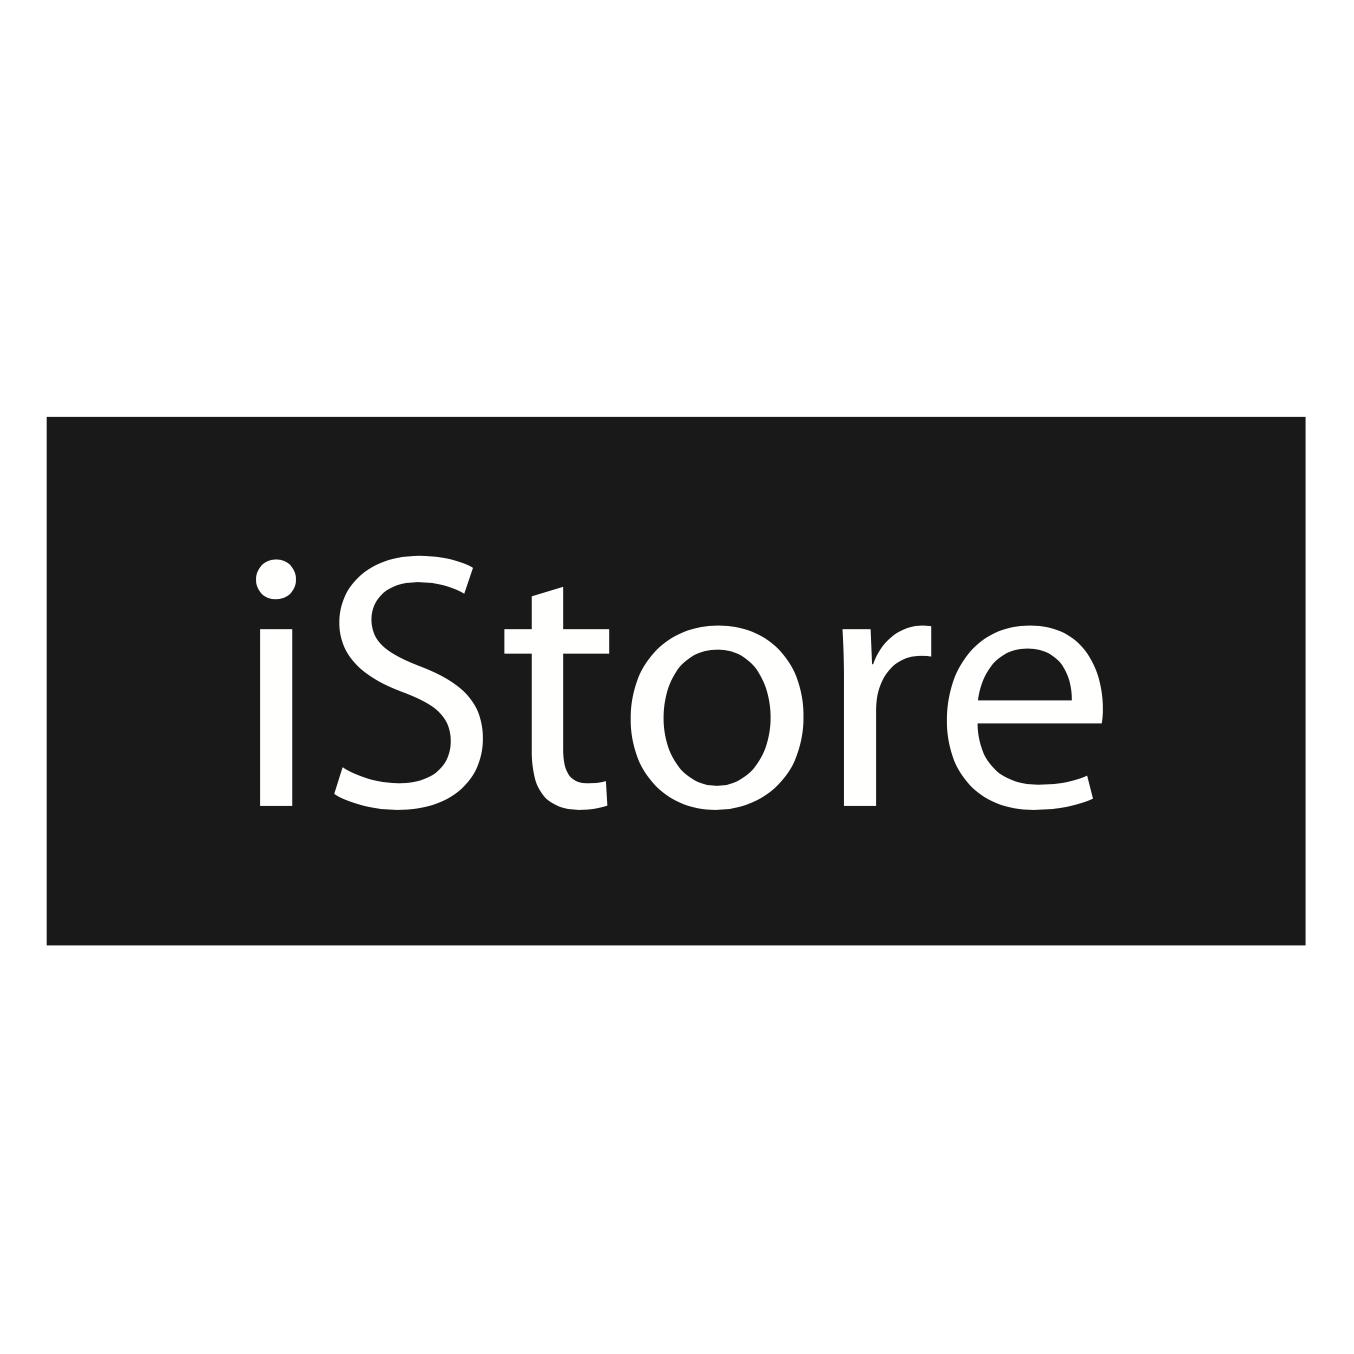 13-inch MacBook Pro   Apple M1 chip 16GB RAM   512GB - Space Grey